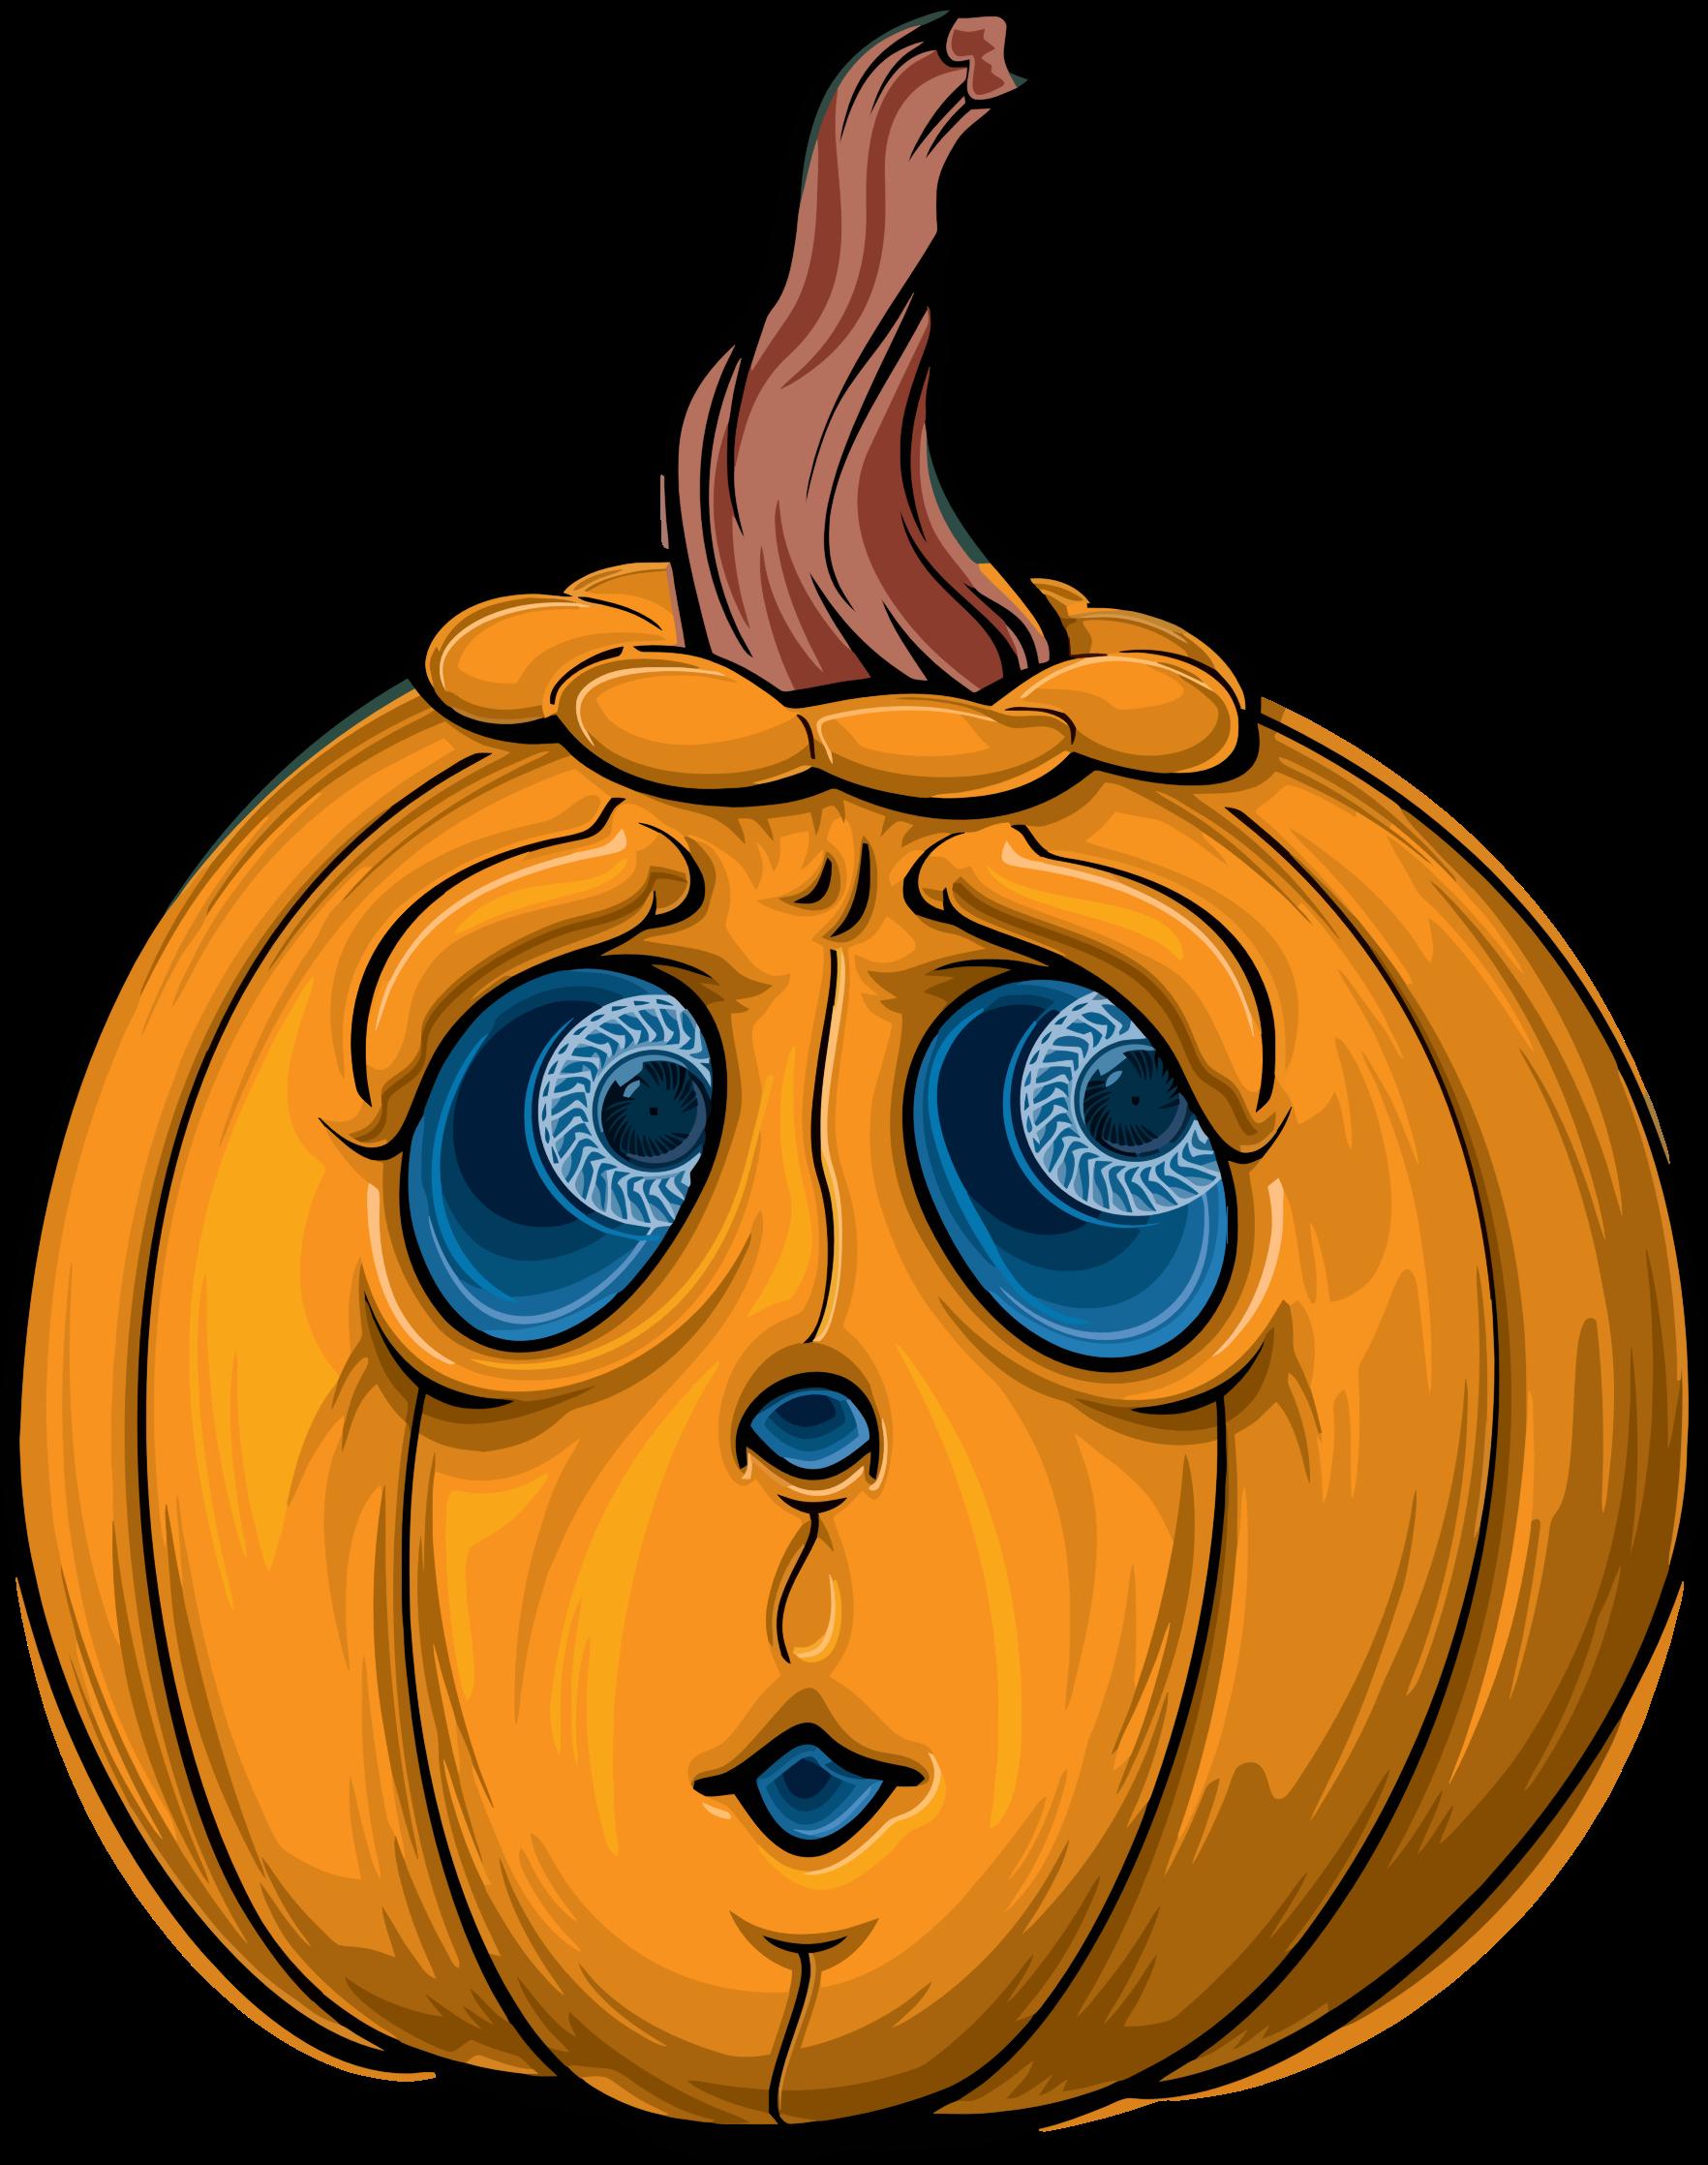 Halloween jack o lantern clipart banner free download Clipart - Halloween Jack O Lantern 2 banner free download